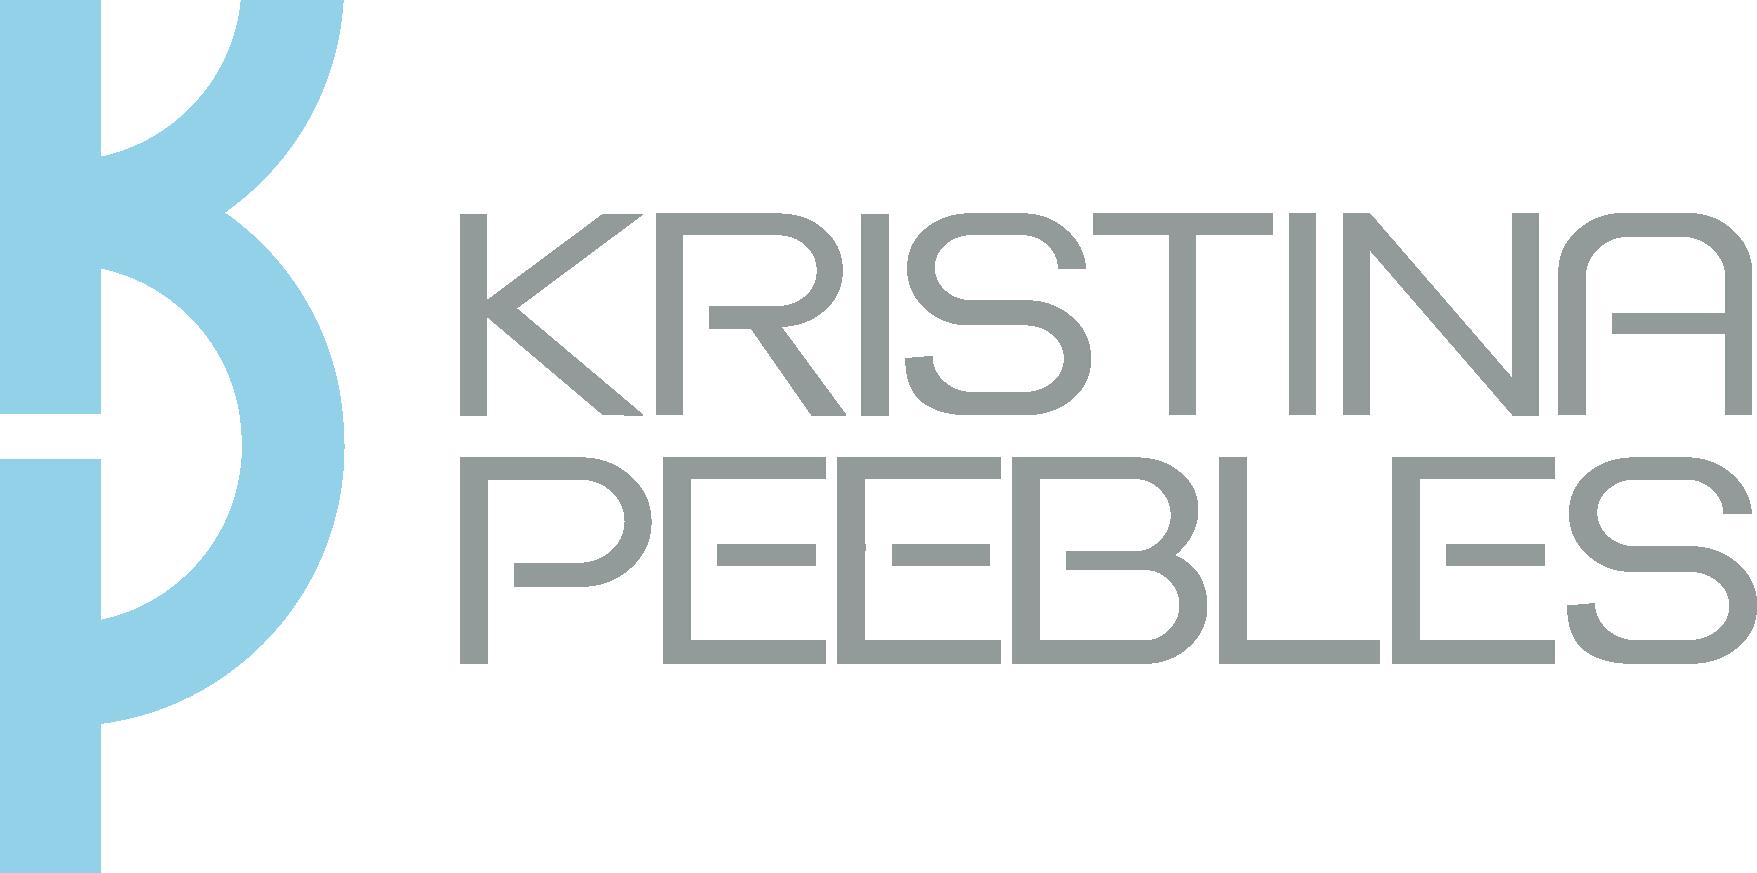 Kristina Peebles